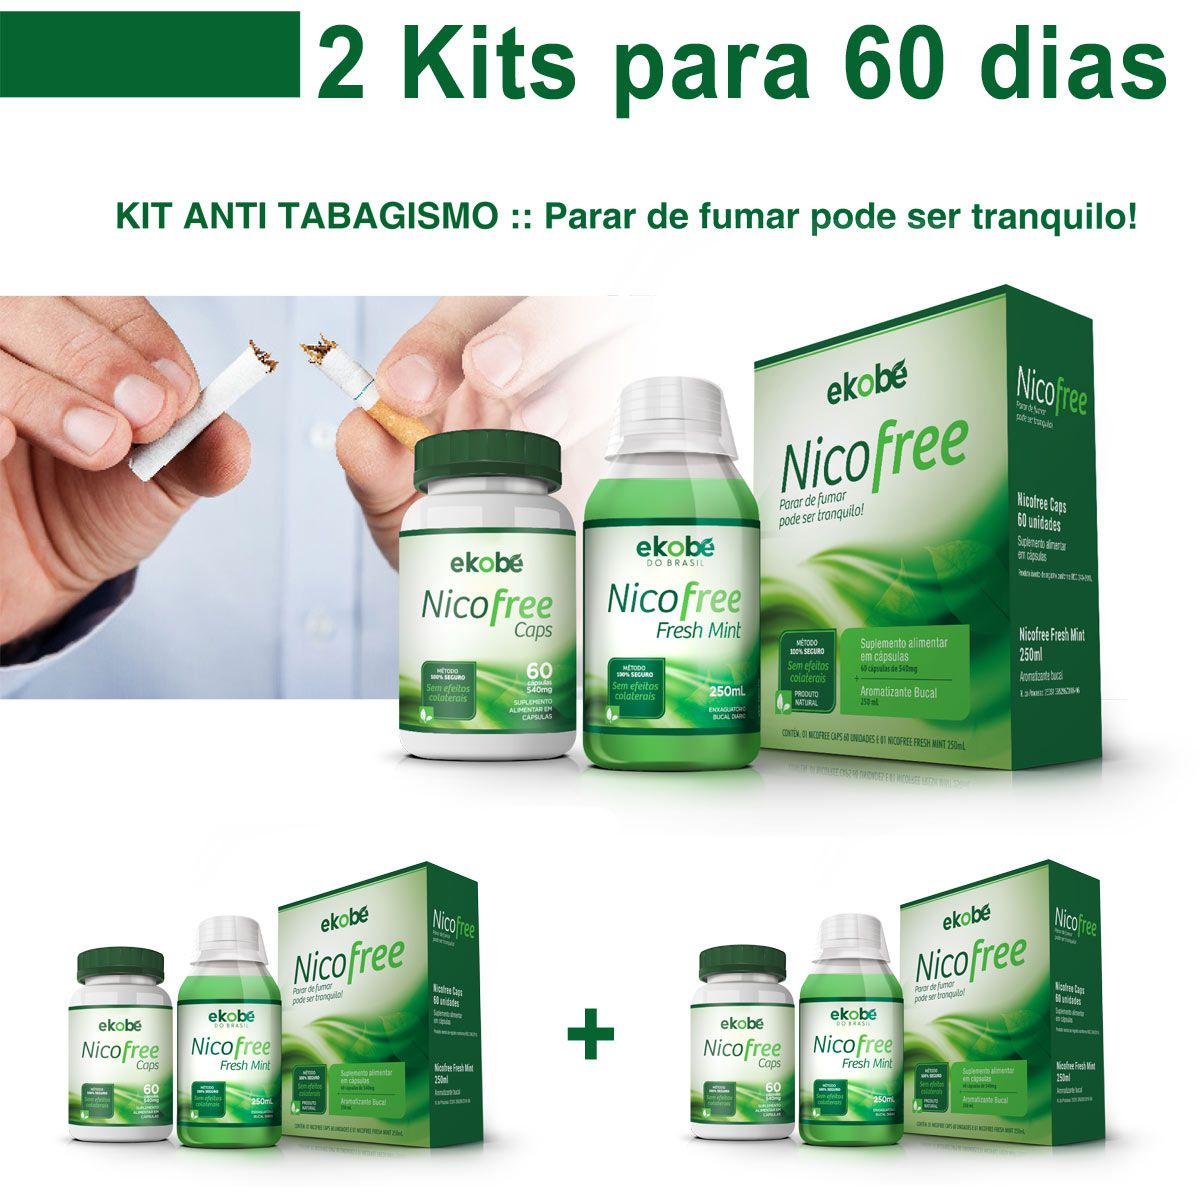 2 Kits Pare de Fumar Com Nico Free Antitabagismo  - Testes Para Drogas e COVID-19. Máscaras e Como Parar de Beber e Fumar